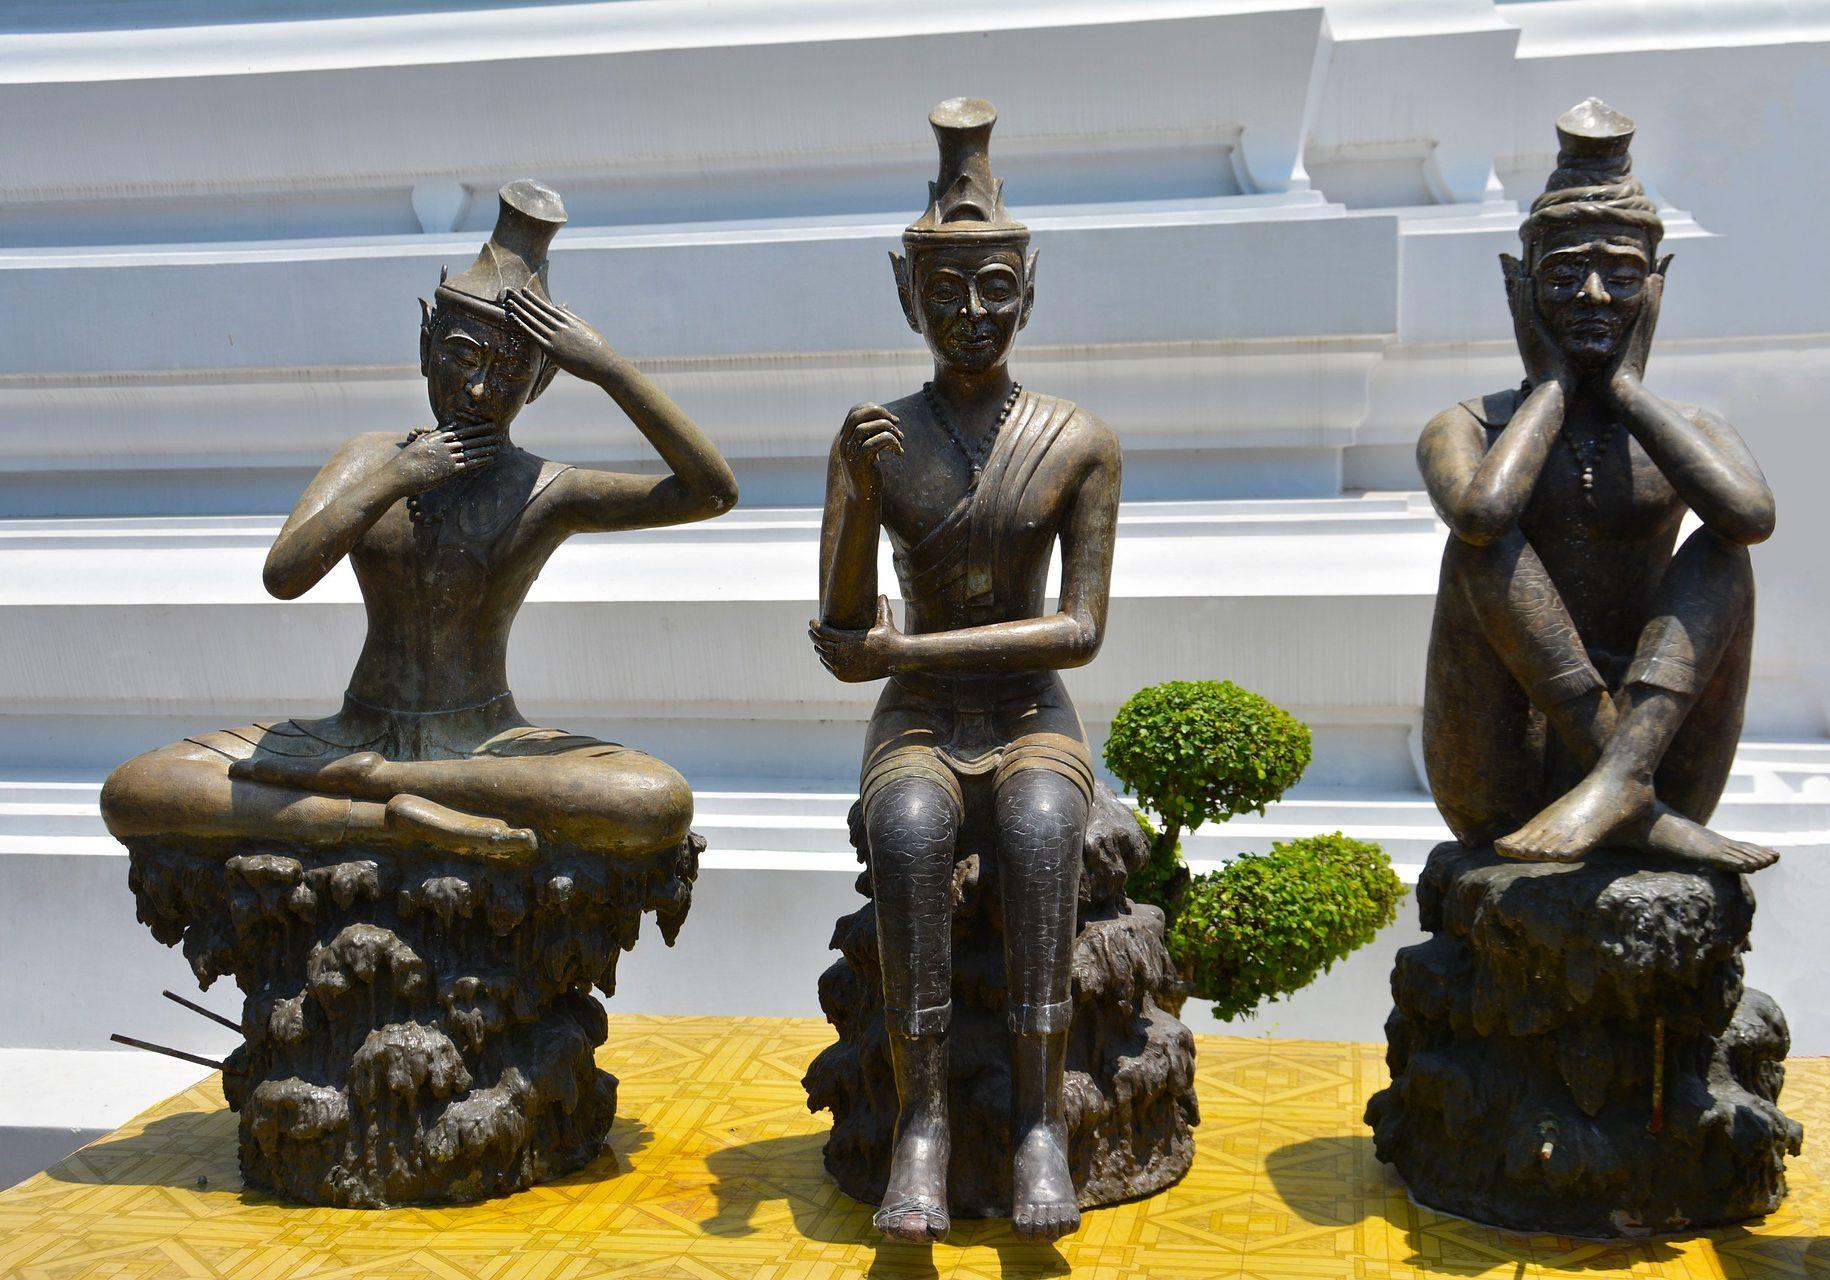 thai-yoga-statues-1383550_1920